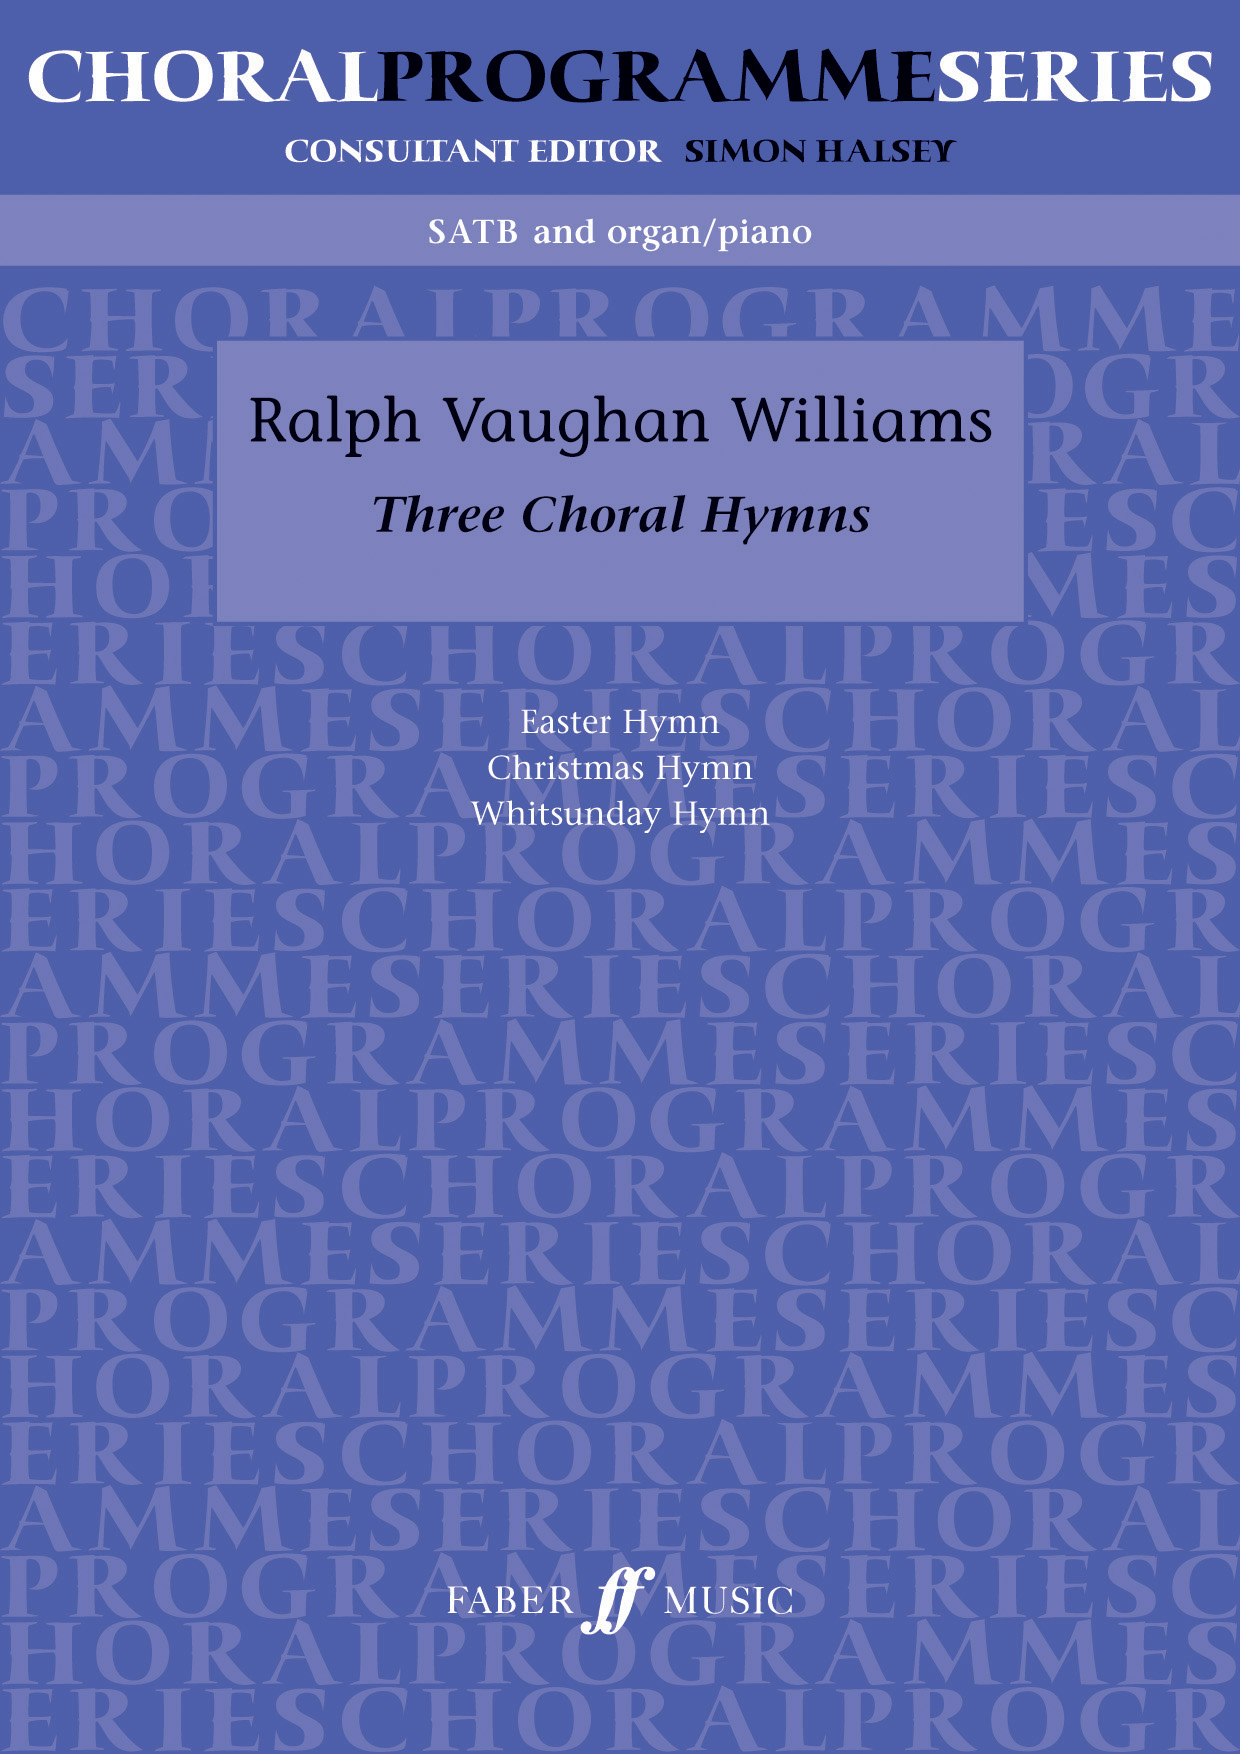 Ralph Vaughan Williams: Three Choral Hymns: SATB: Vocal Score